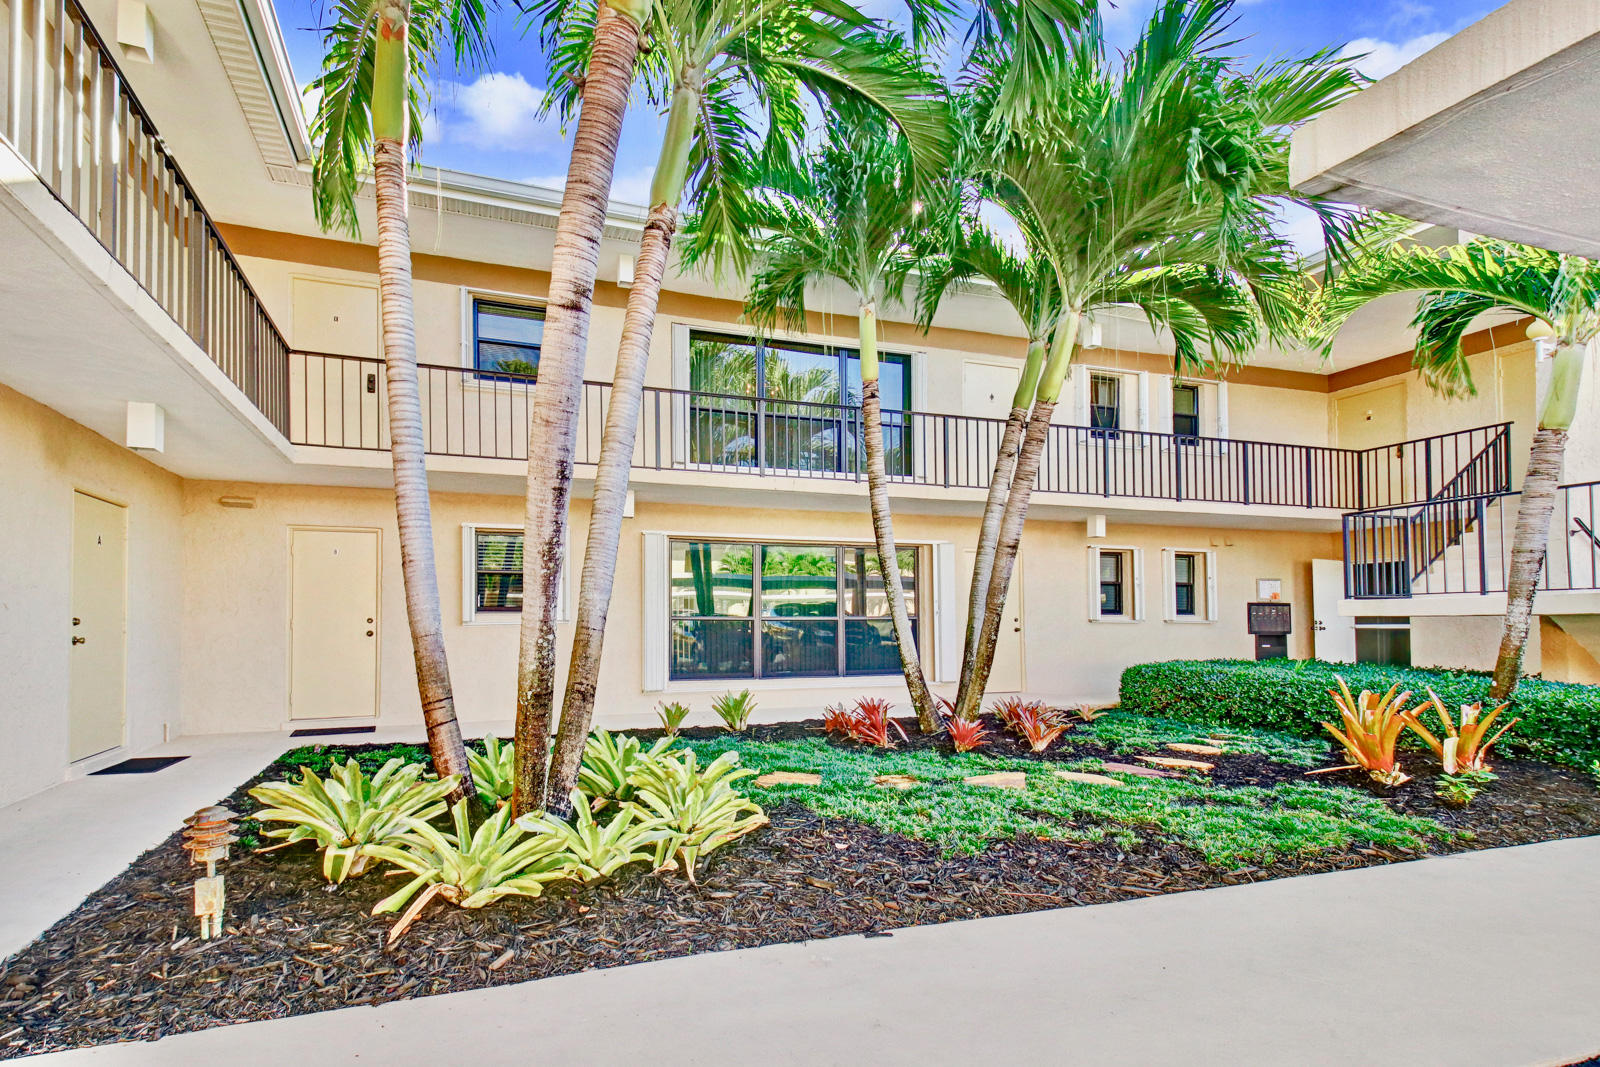 2 Turtle Creek Drive E, Jupiter, Florida 33469, 3 Bedrooms Bedrooms, ,2.1 BathroomsBathrooms,A,Condominium,Turtle Creek,RX-10476783